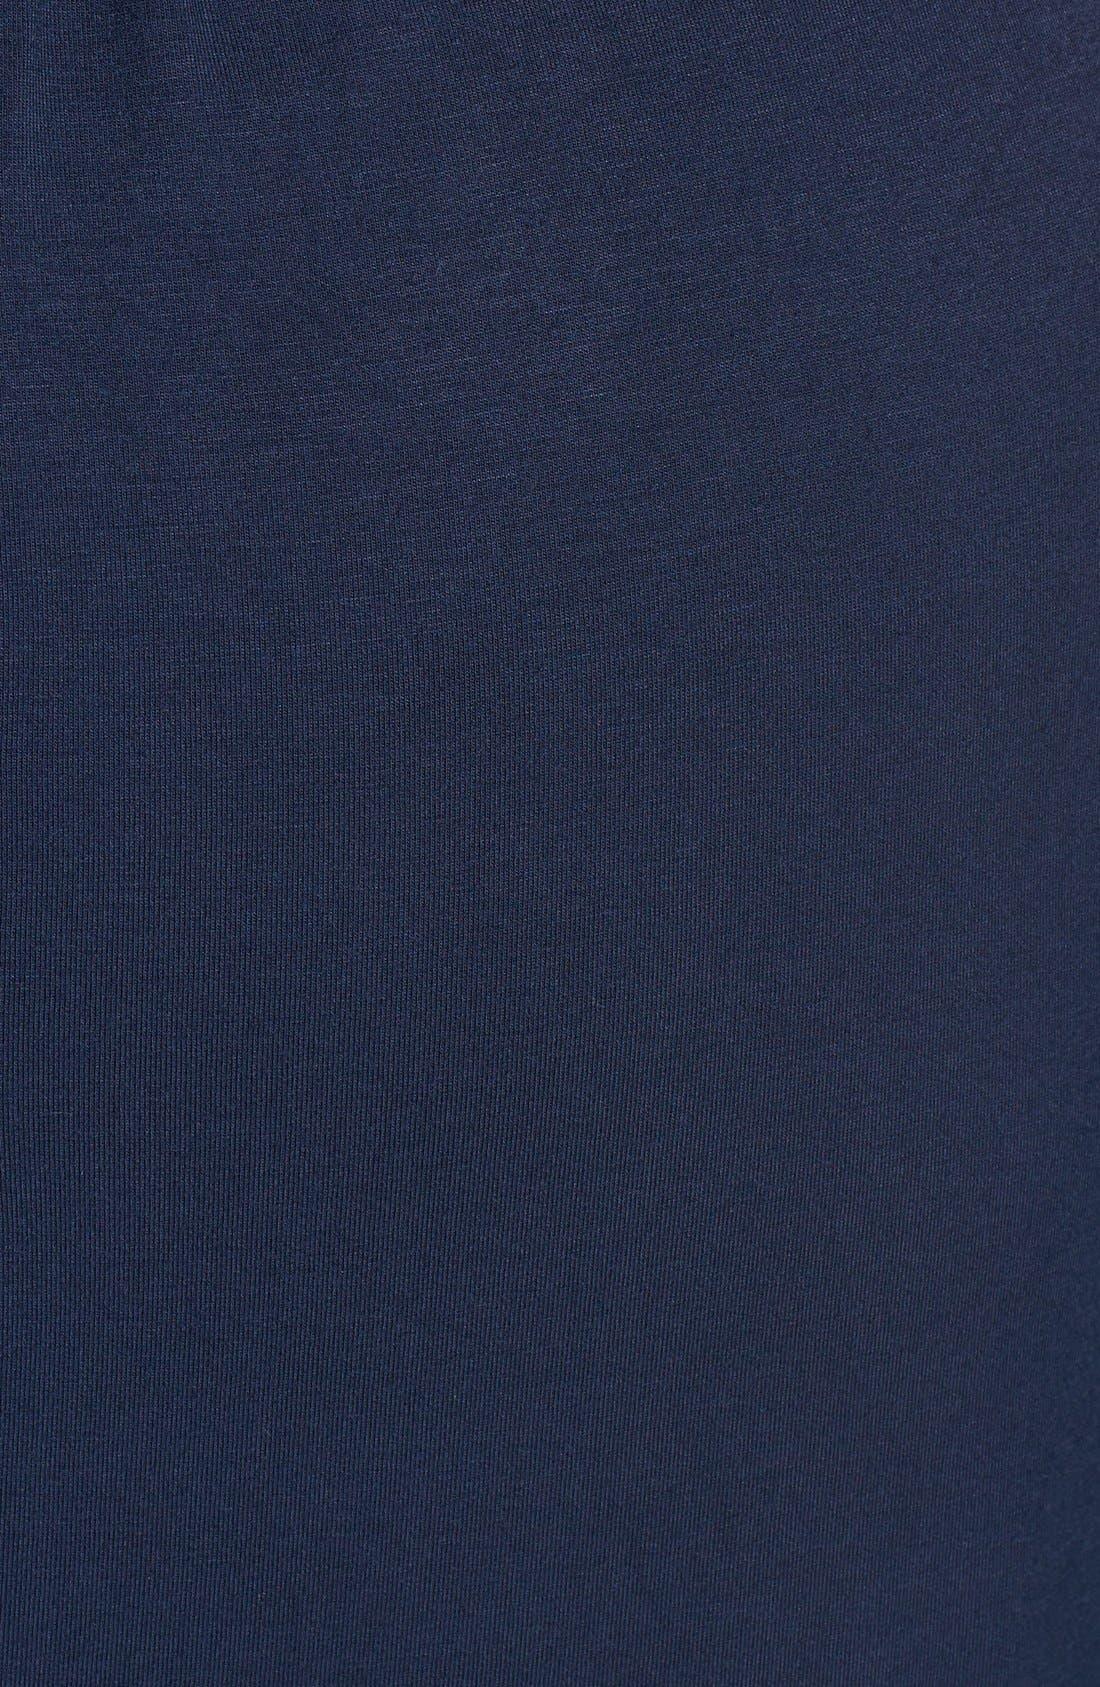 Alternate Image 3  - Loveappella V-Neck Jersey Maxi Dress (Plus Size)